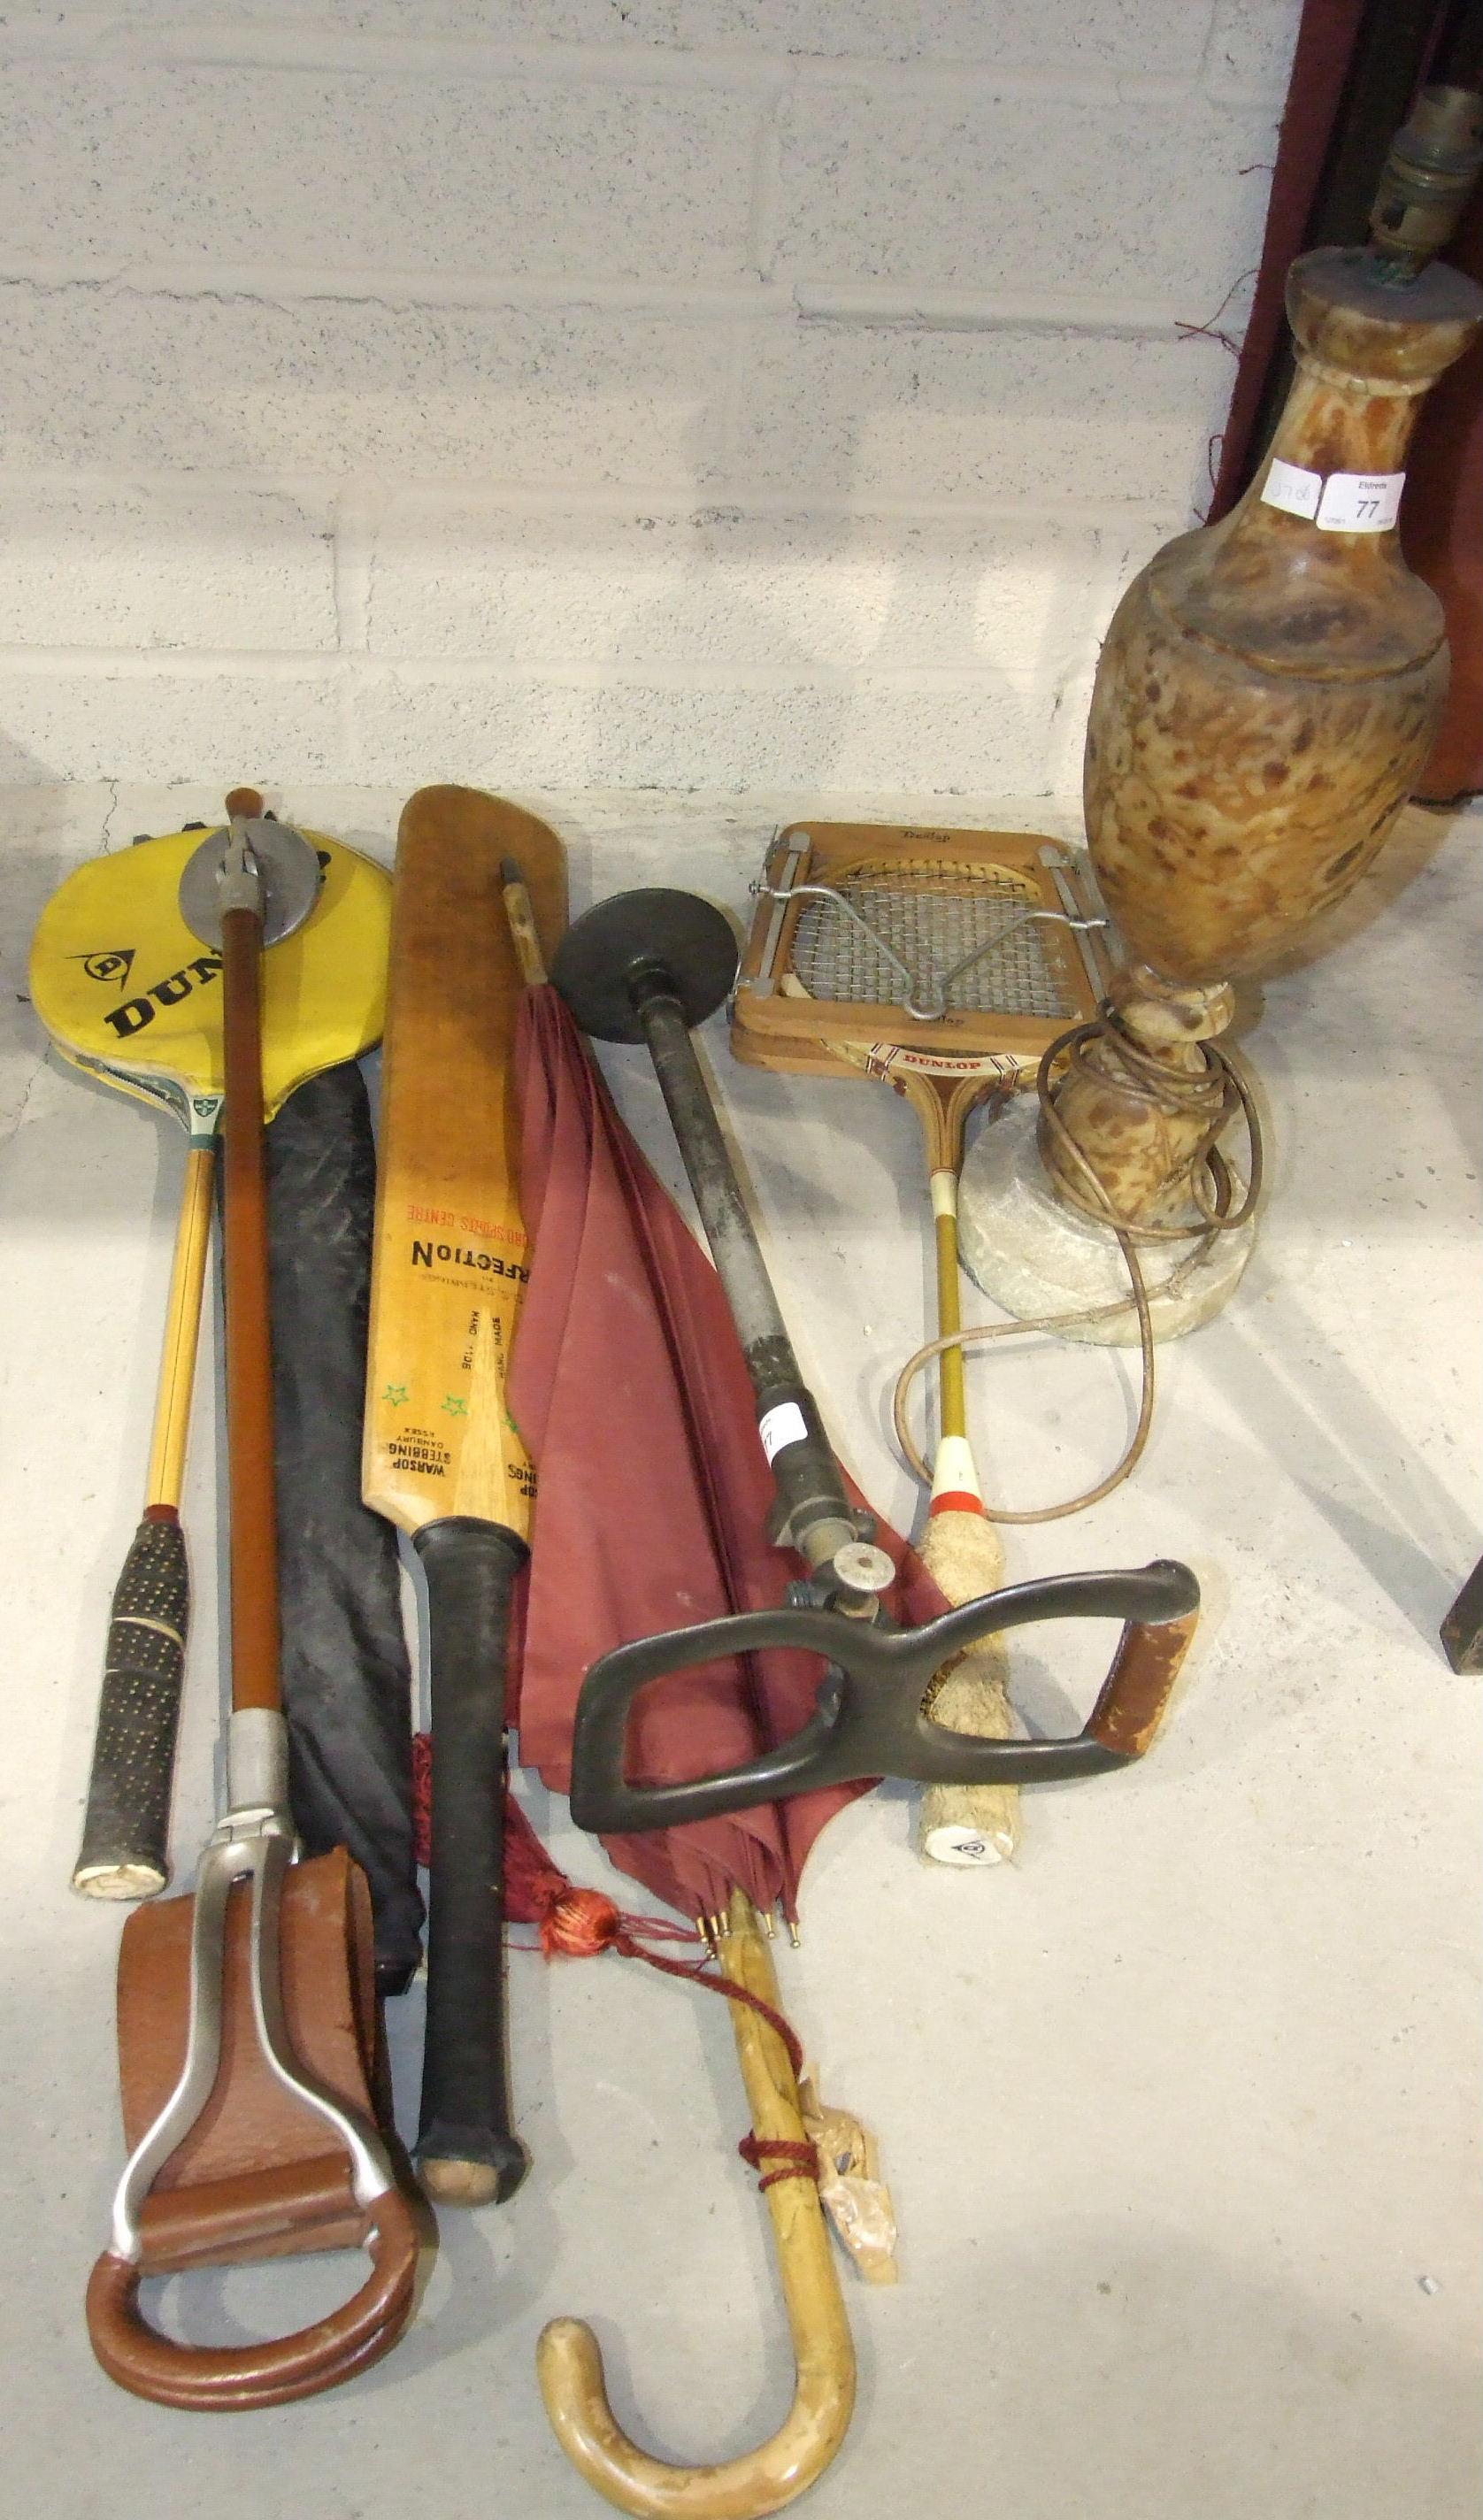 Lot 77 - A W Mills Ltd, Sunderland alloy telescopic shooting stick, a modern shooting stick, a marble lamp